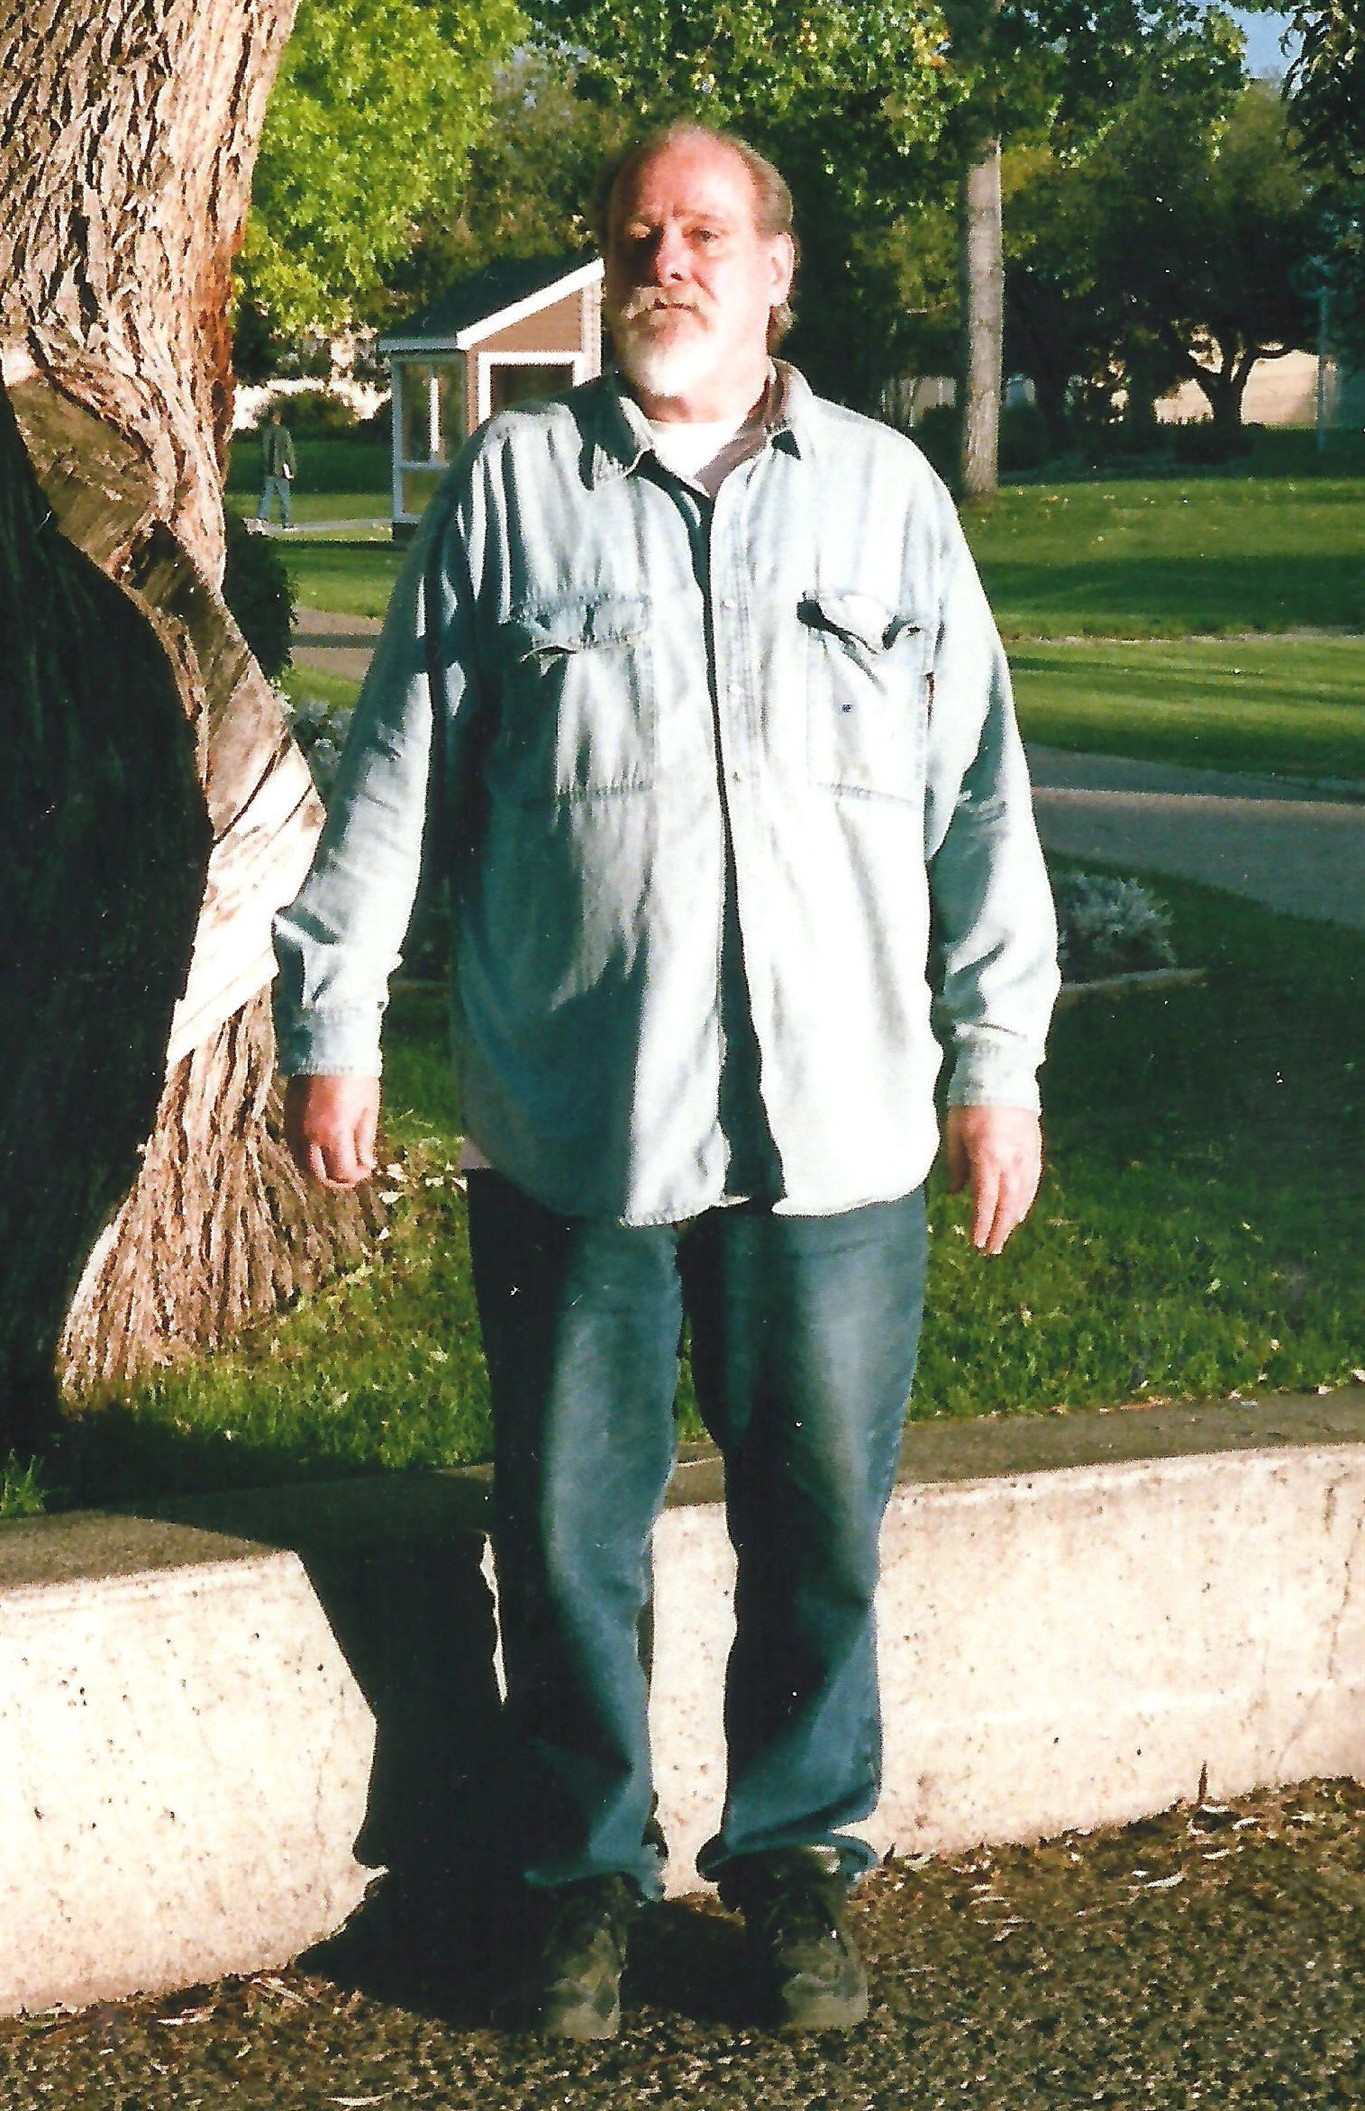 Betesh, jailed for Toronto shoeshine-boy murder, joins website to